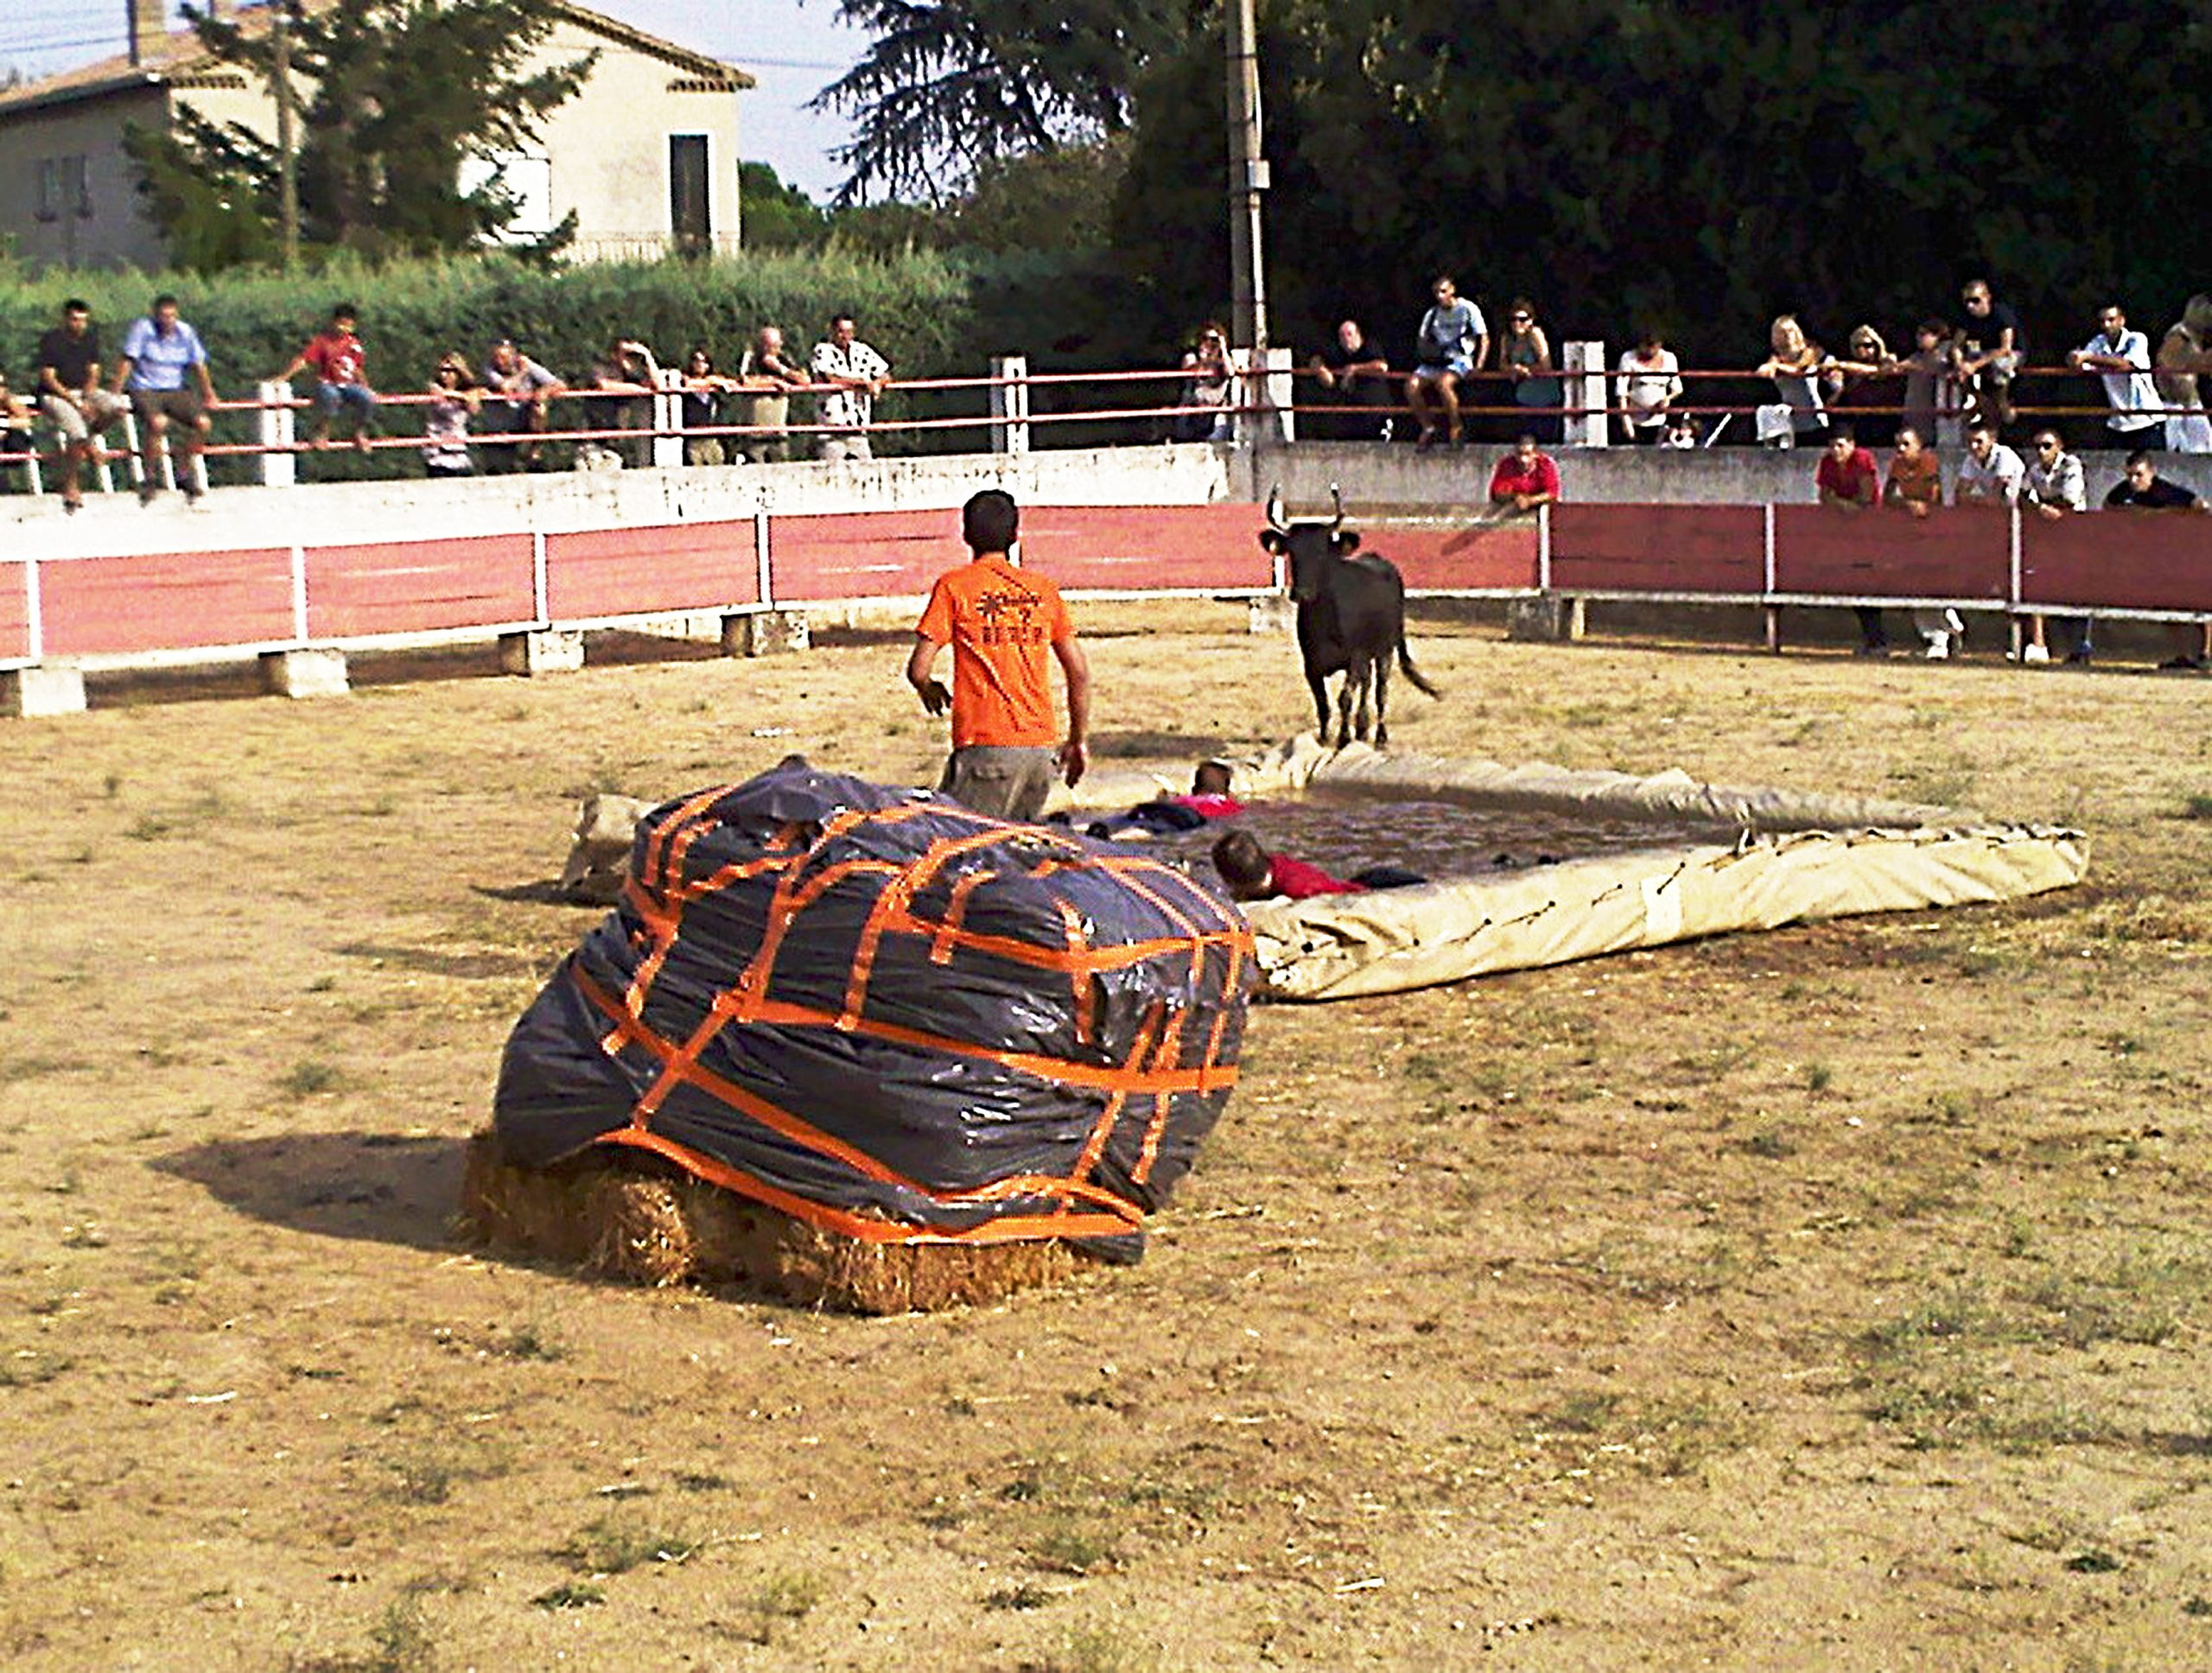 Toro-Piscine — Wikipédia intérieur Toro Piscine Labat